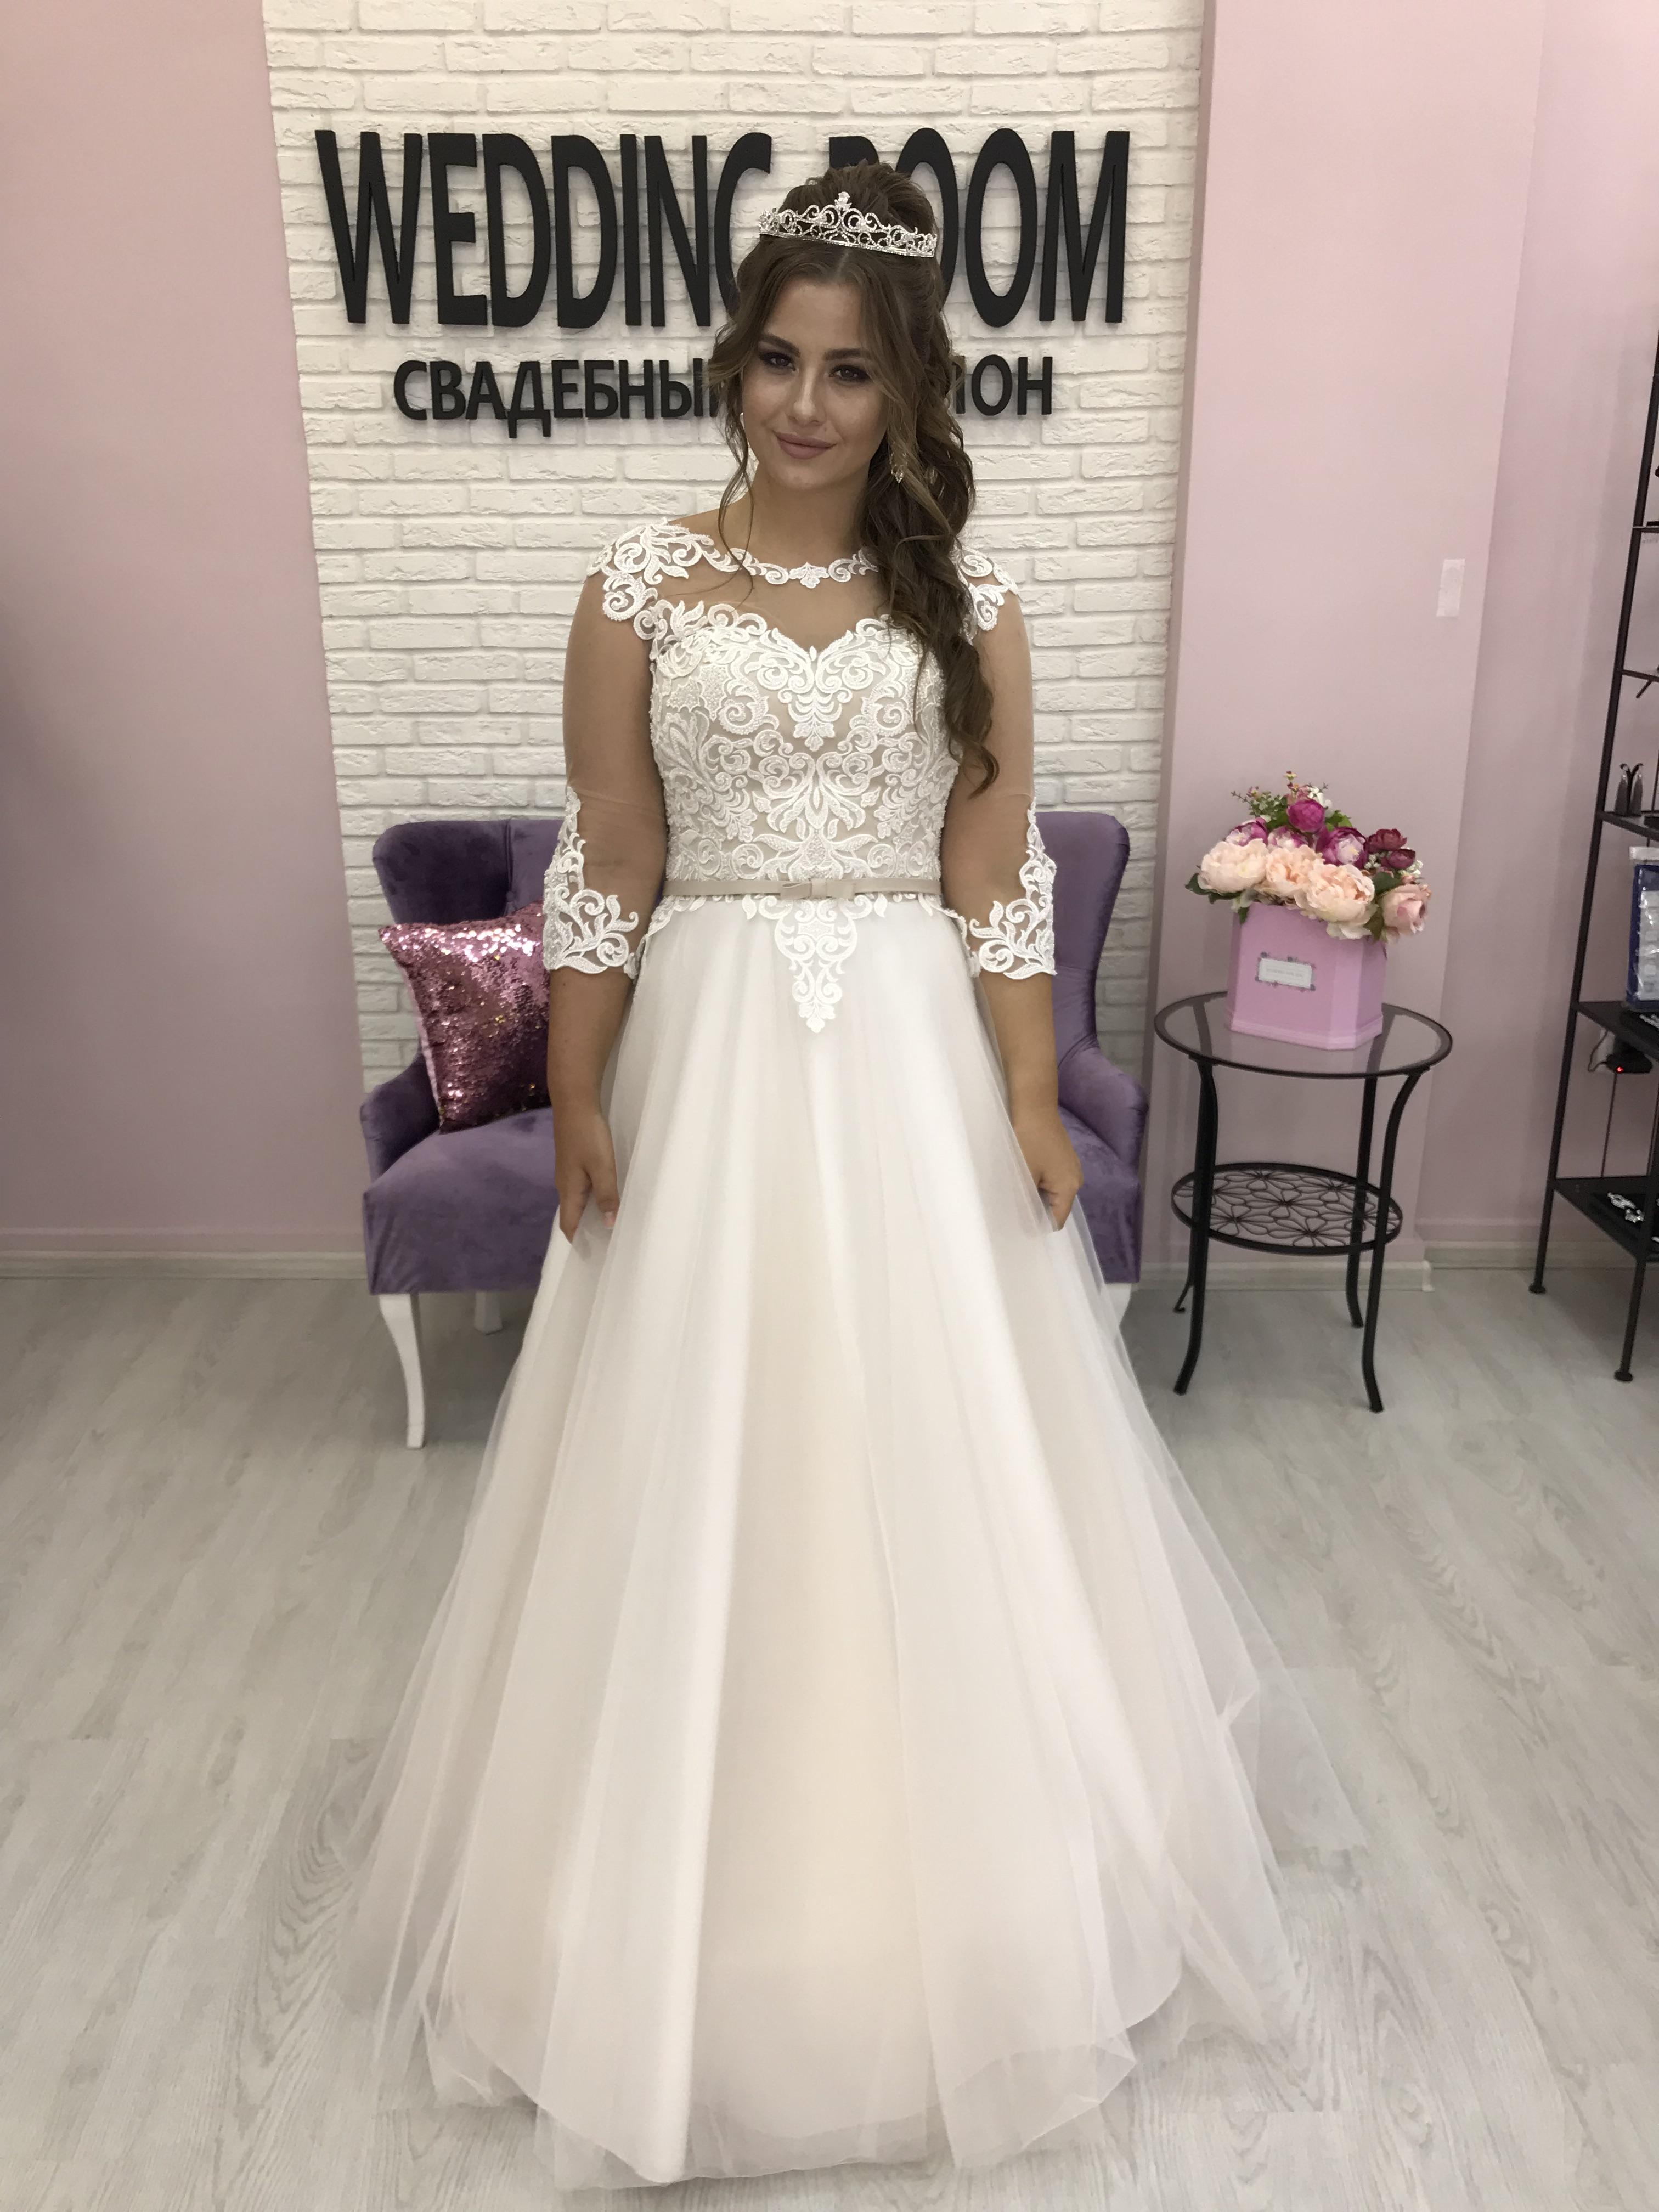 Wedding Room, свадебный салон  в Самаре